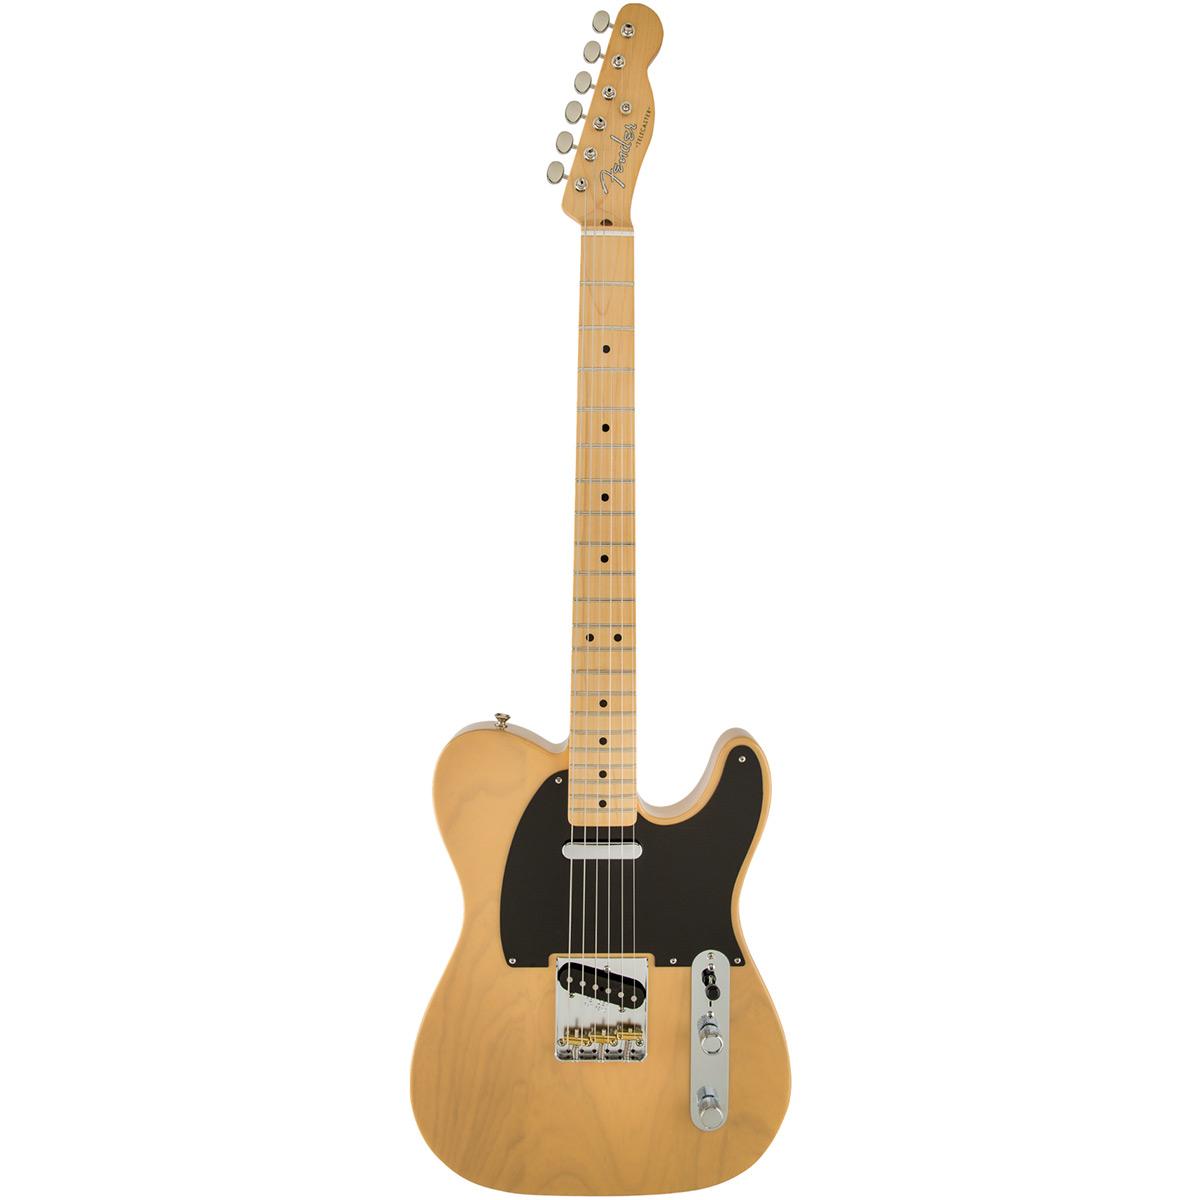 Fender ClassicPlayerBajaTelecaster,MN,BLD el-guitar blonde